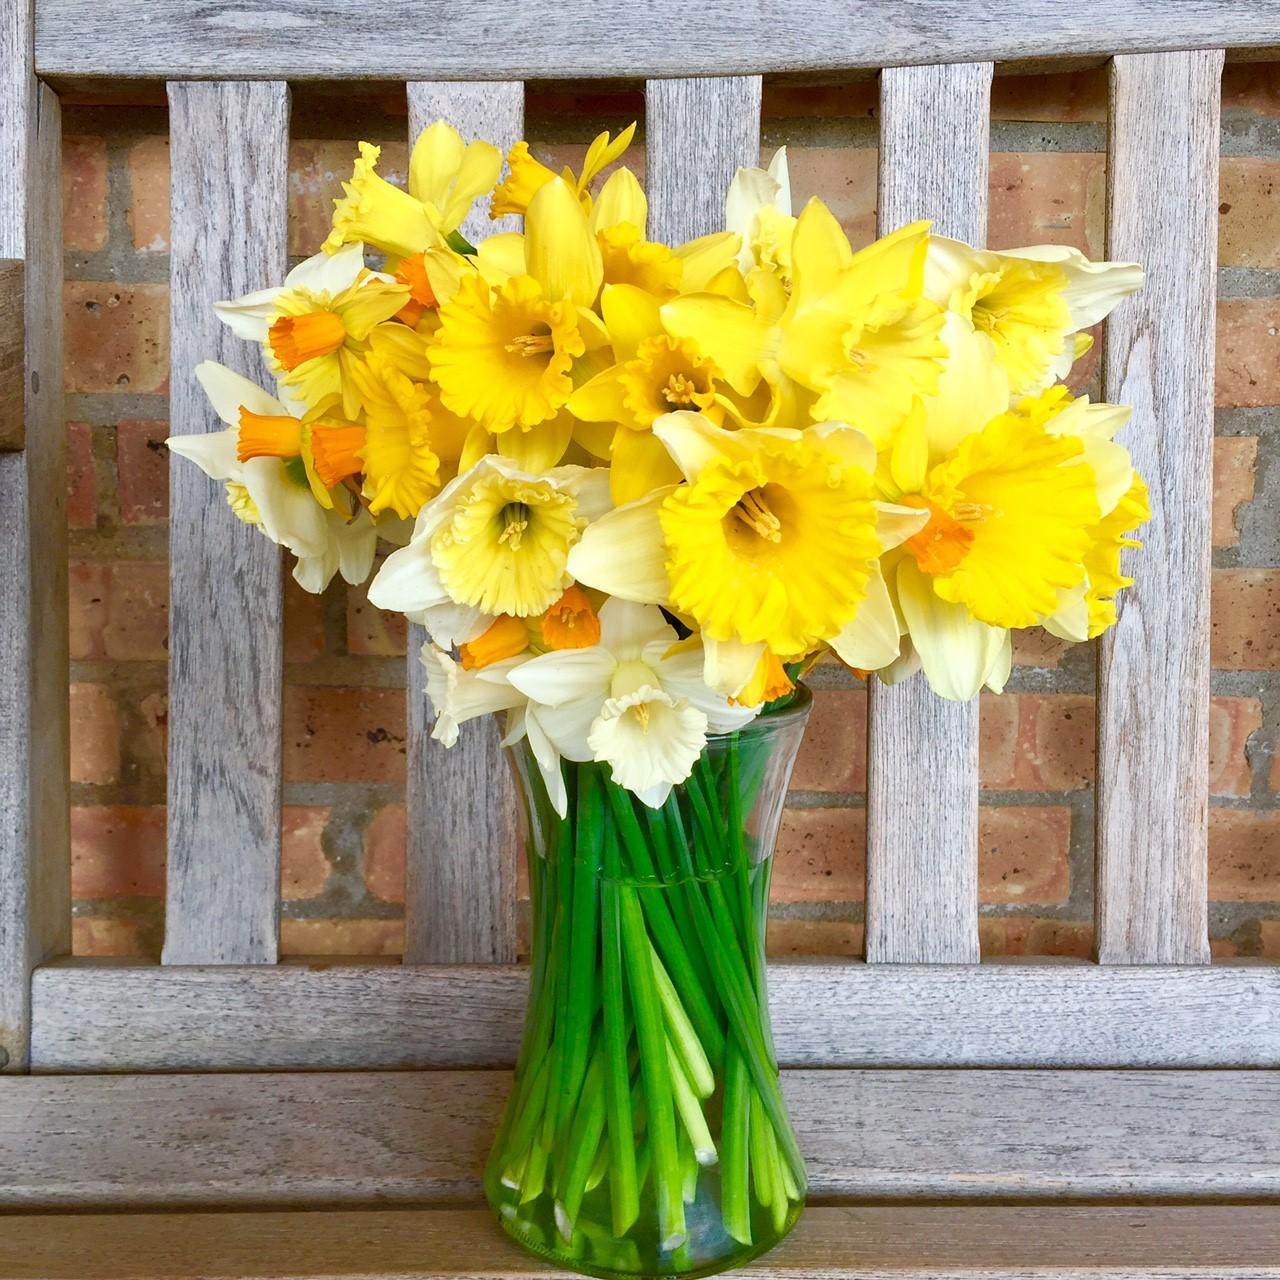 daffodil - photo #22